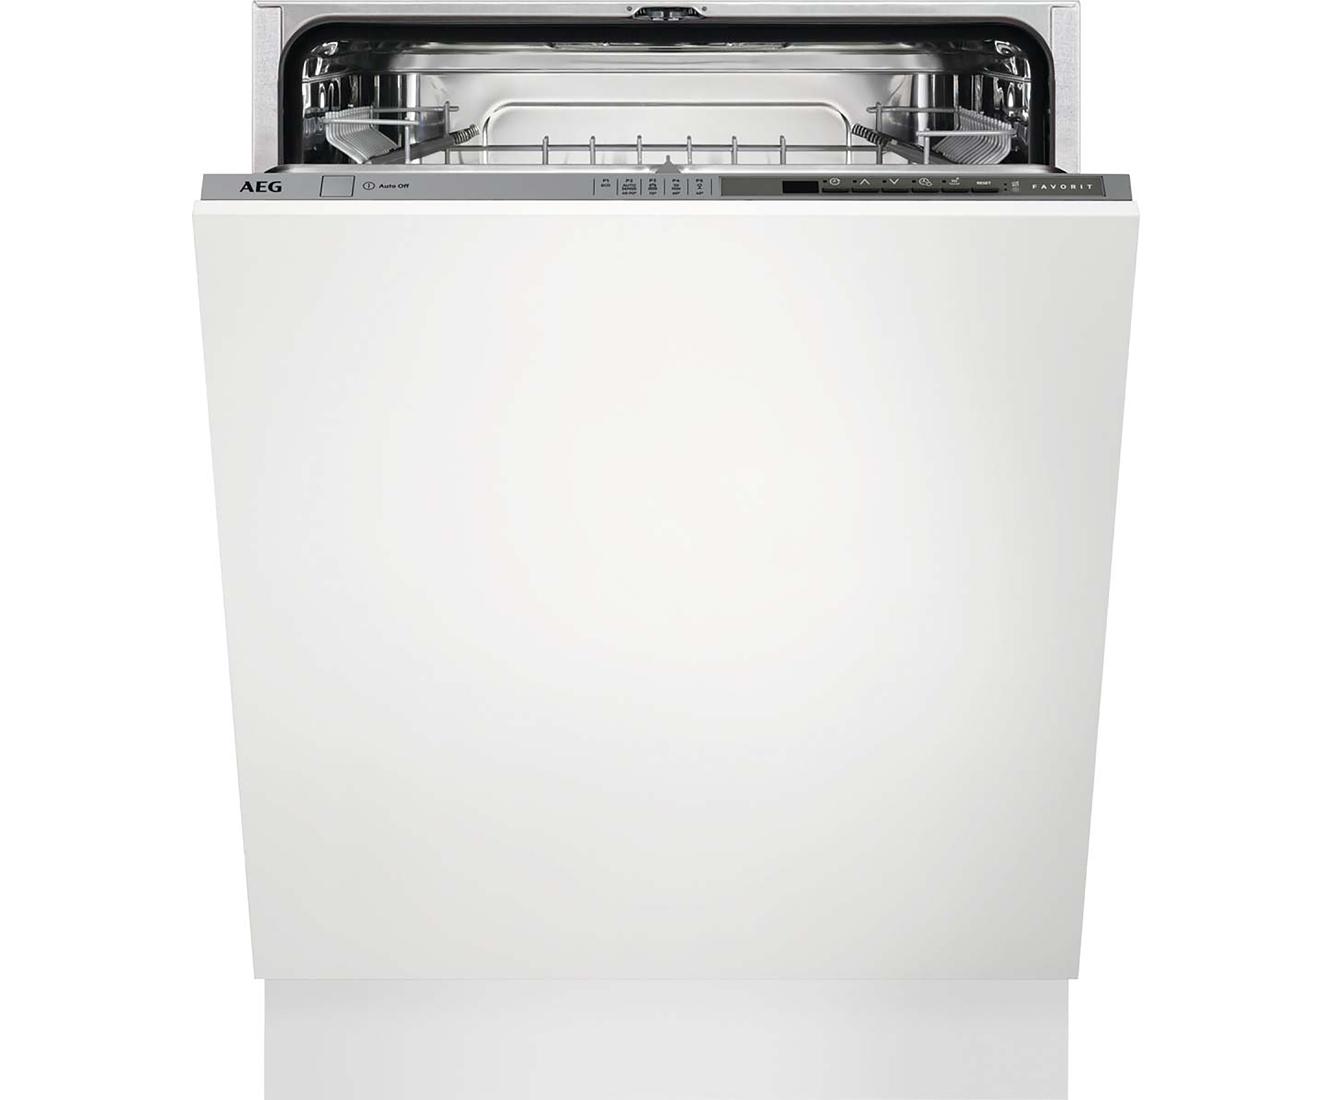 Aeg Kühlschrank Zu Kalt Auf Stufe 1 : Aeg fss az geschirrspüler favorit eingebaut cm edelstahl neu